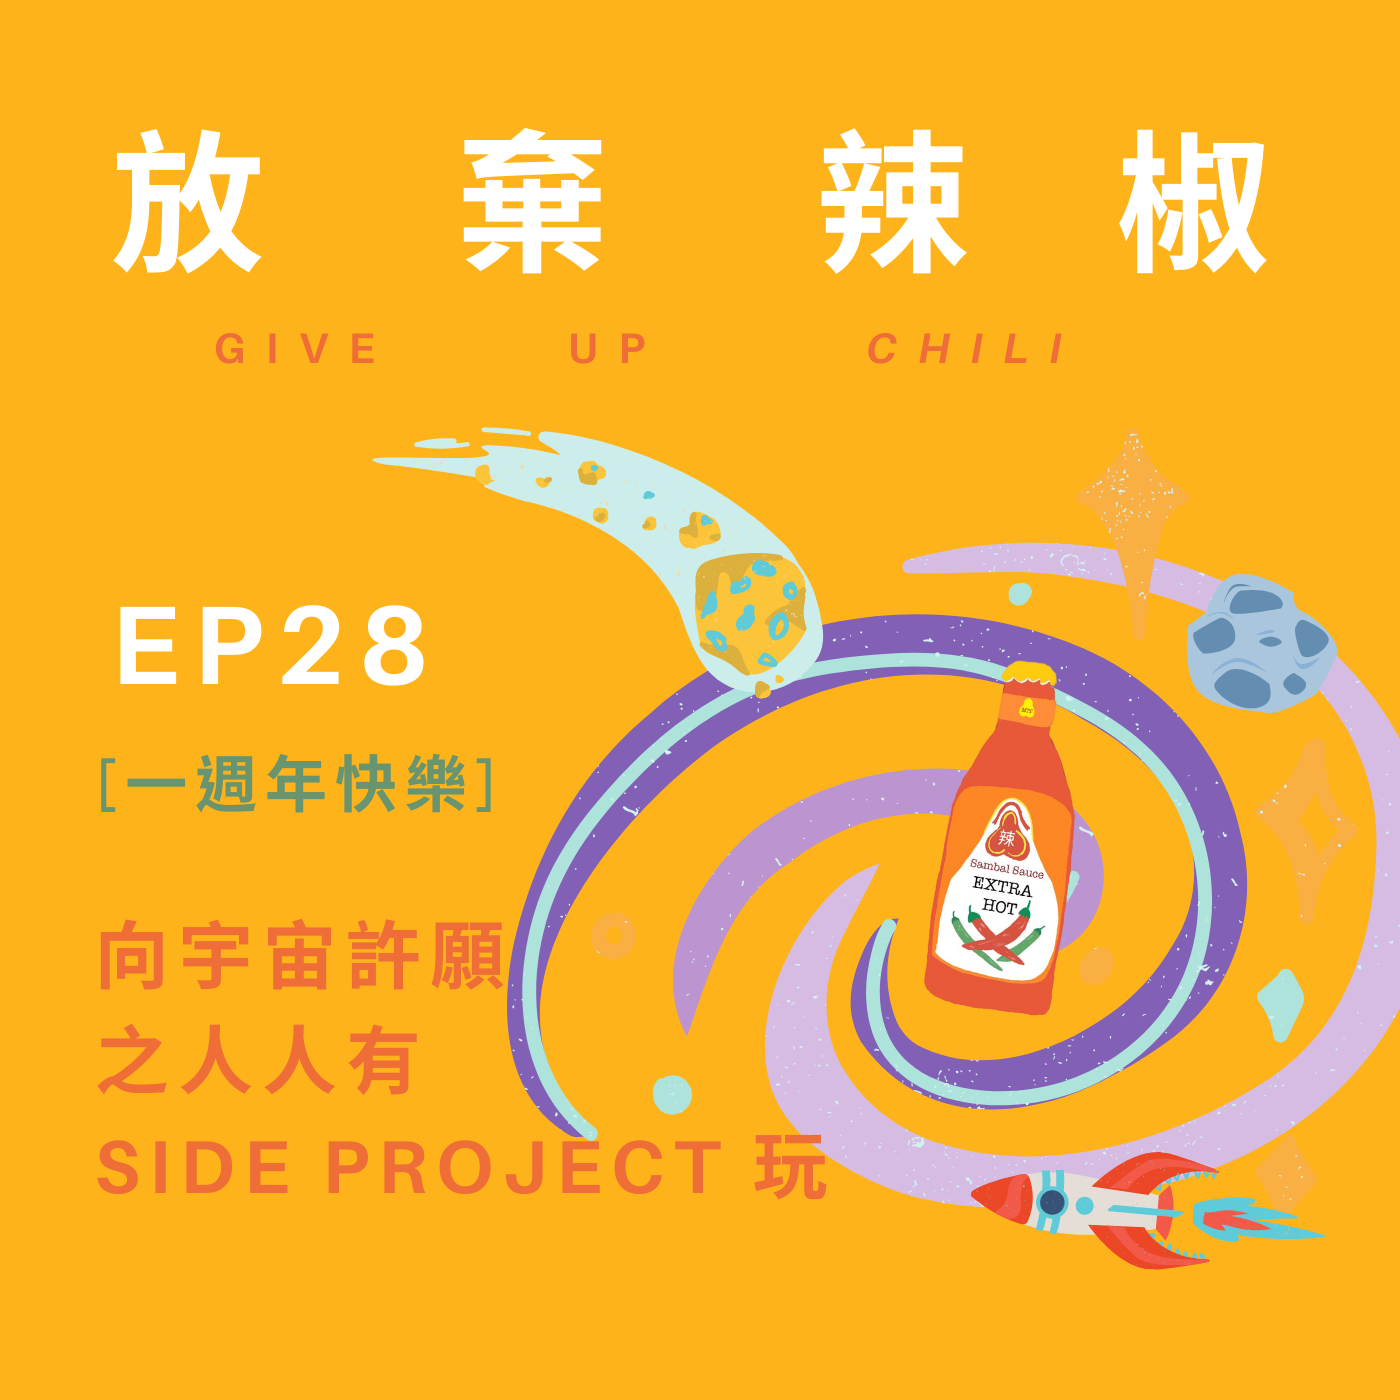 EP28:週年特輯 - 向宇宙許願之人人有 Side project 玩!